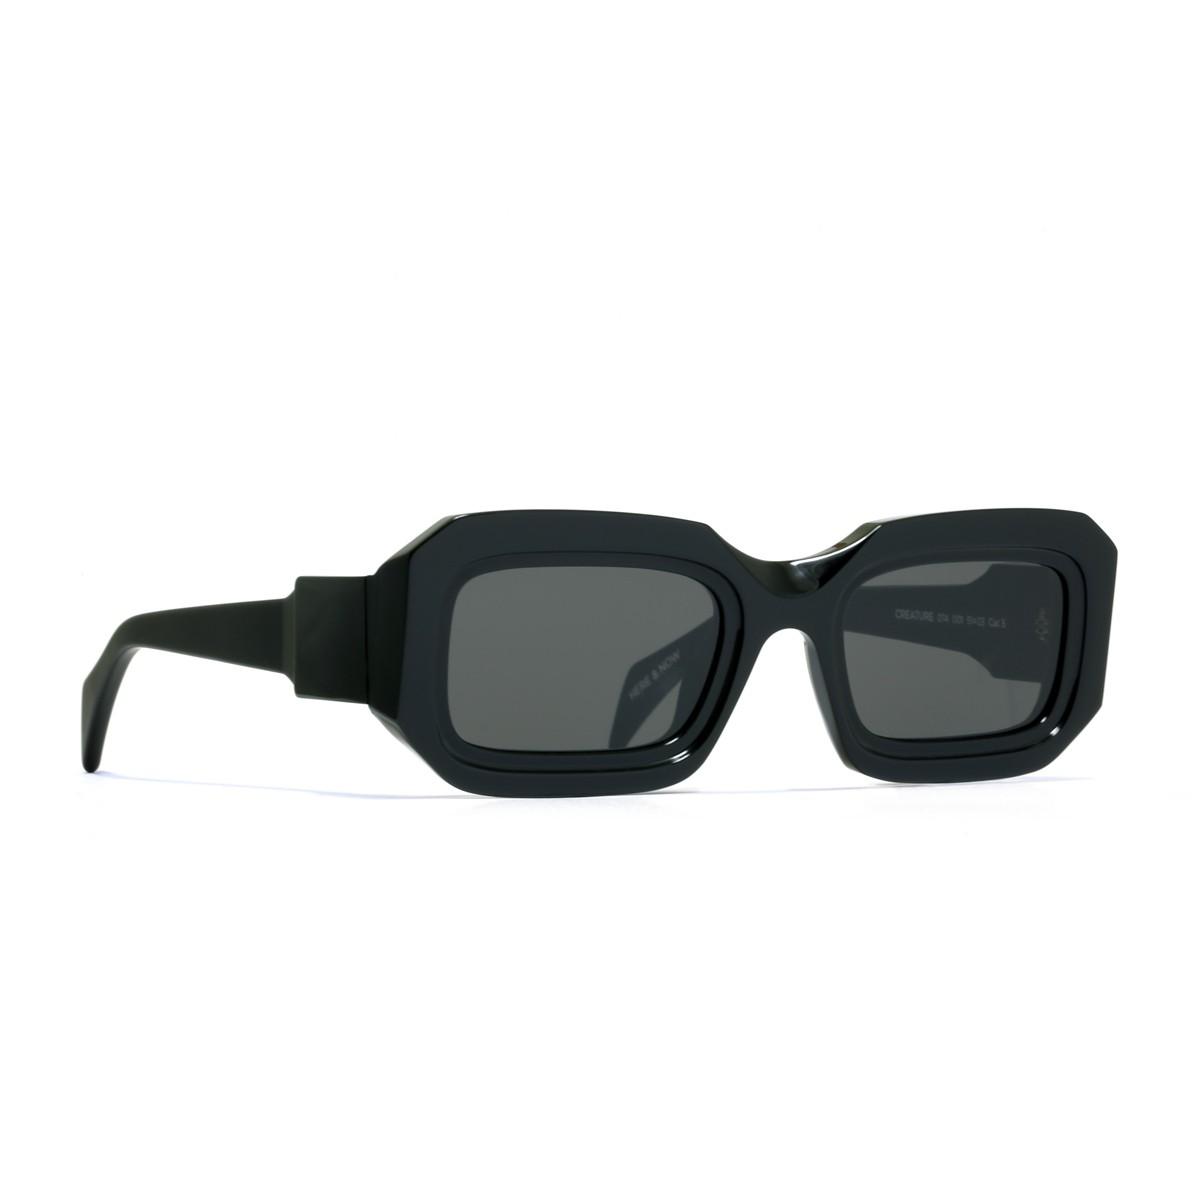 Siens Eye code 074 | Unisex sunglasses